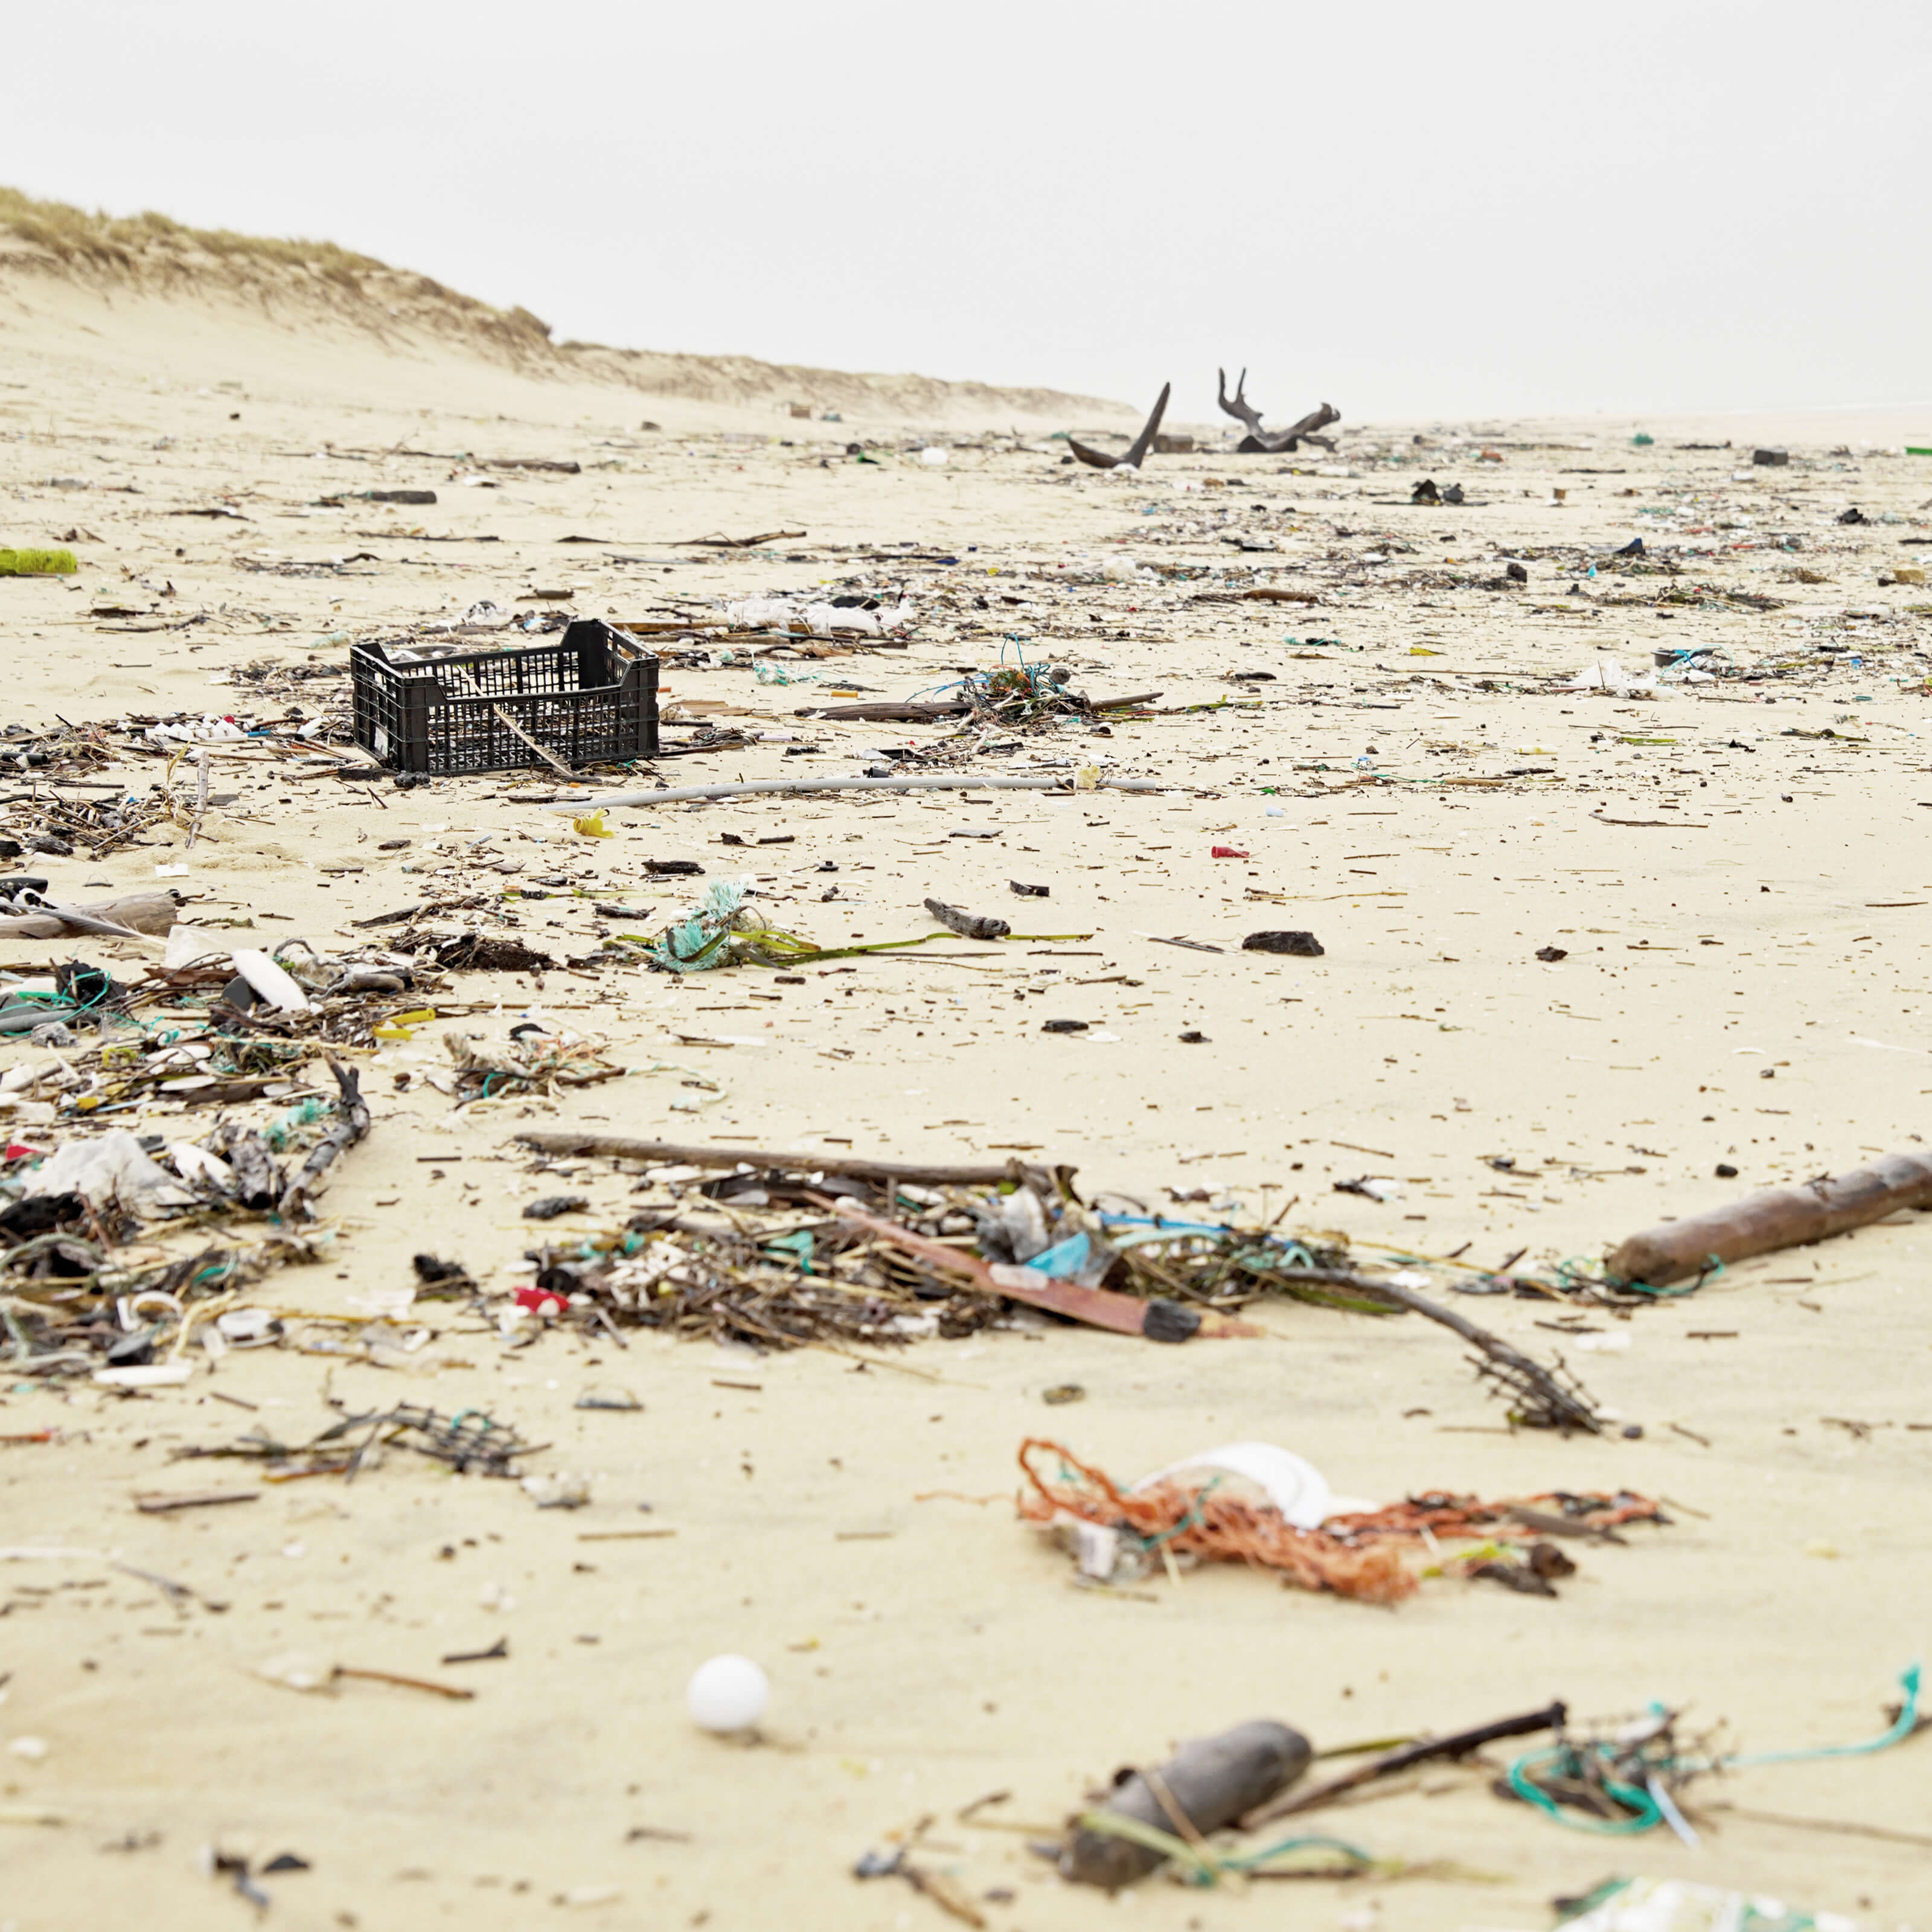 beach, trash, sand